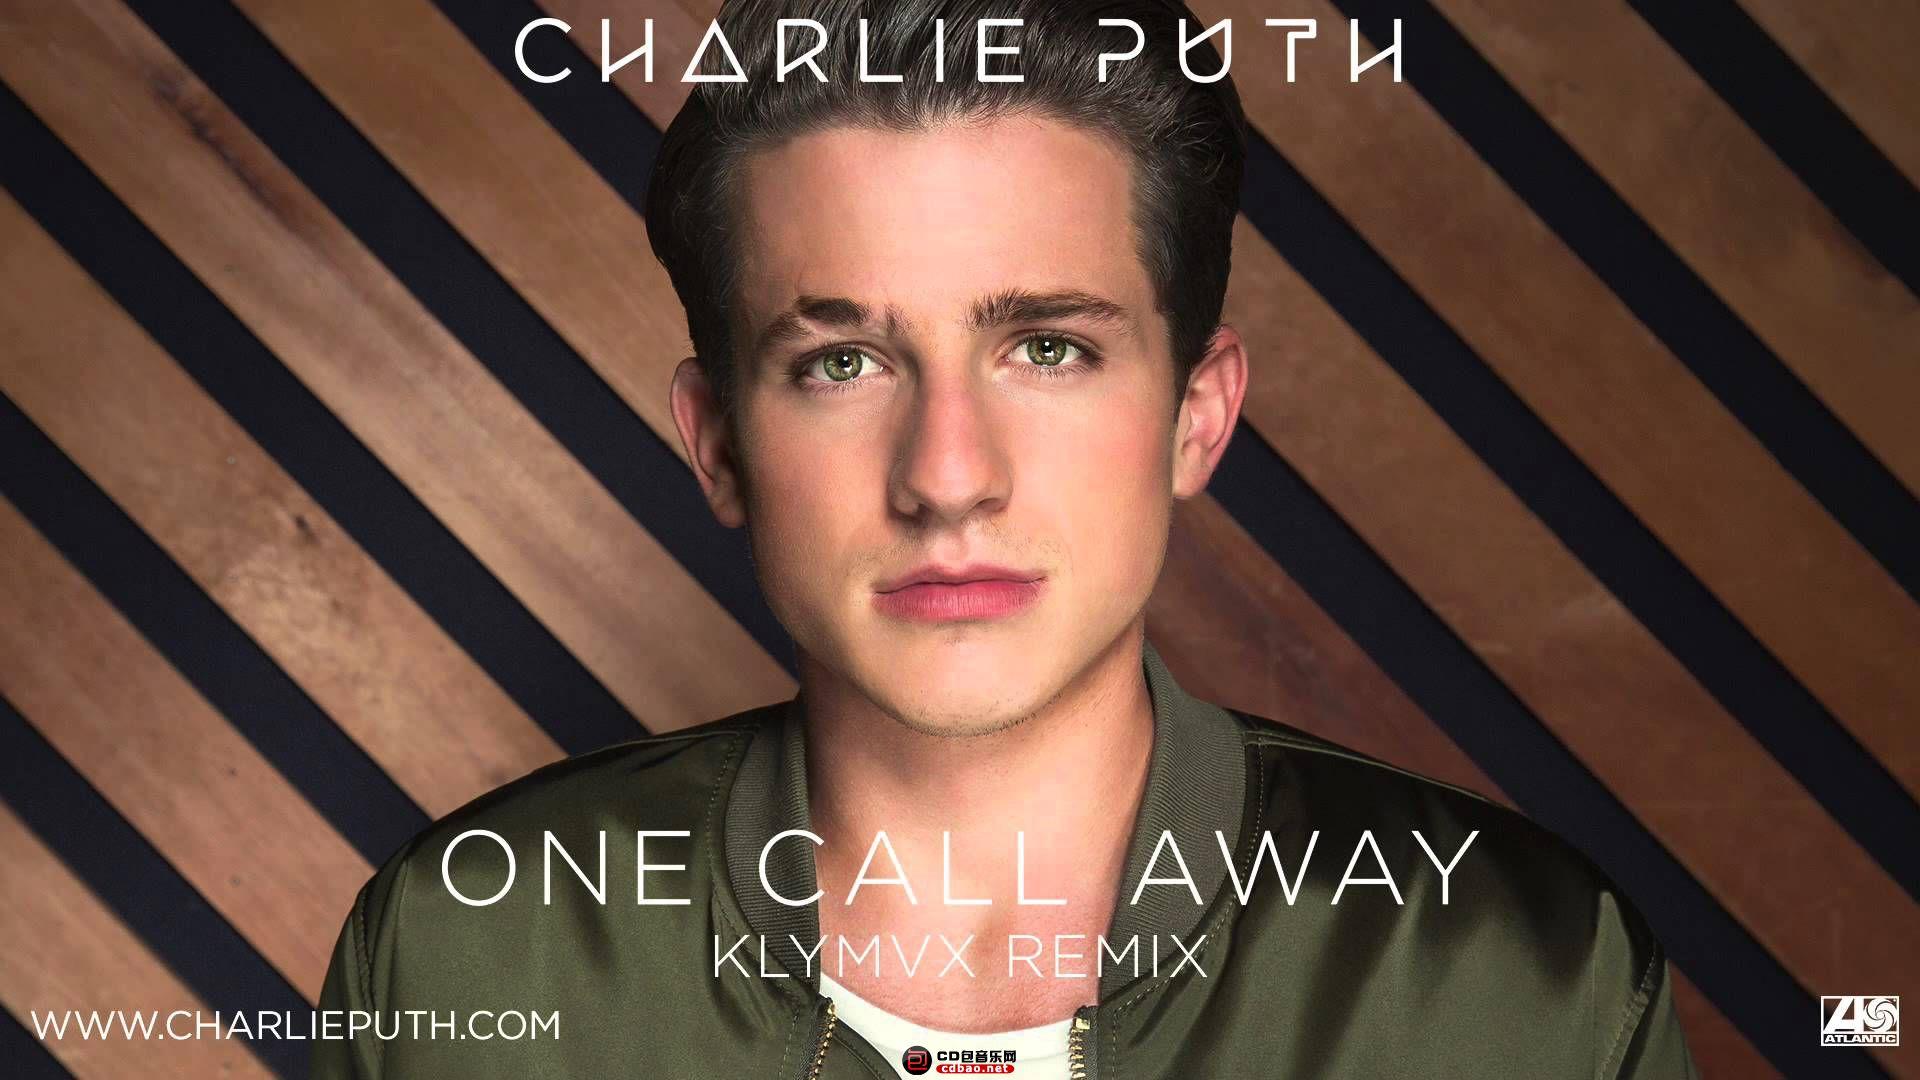 Charlie Puth - One Call Away.jpg